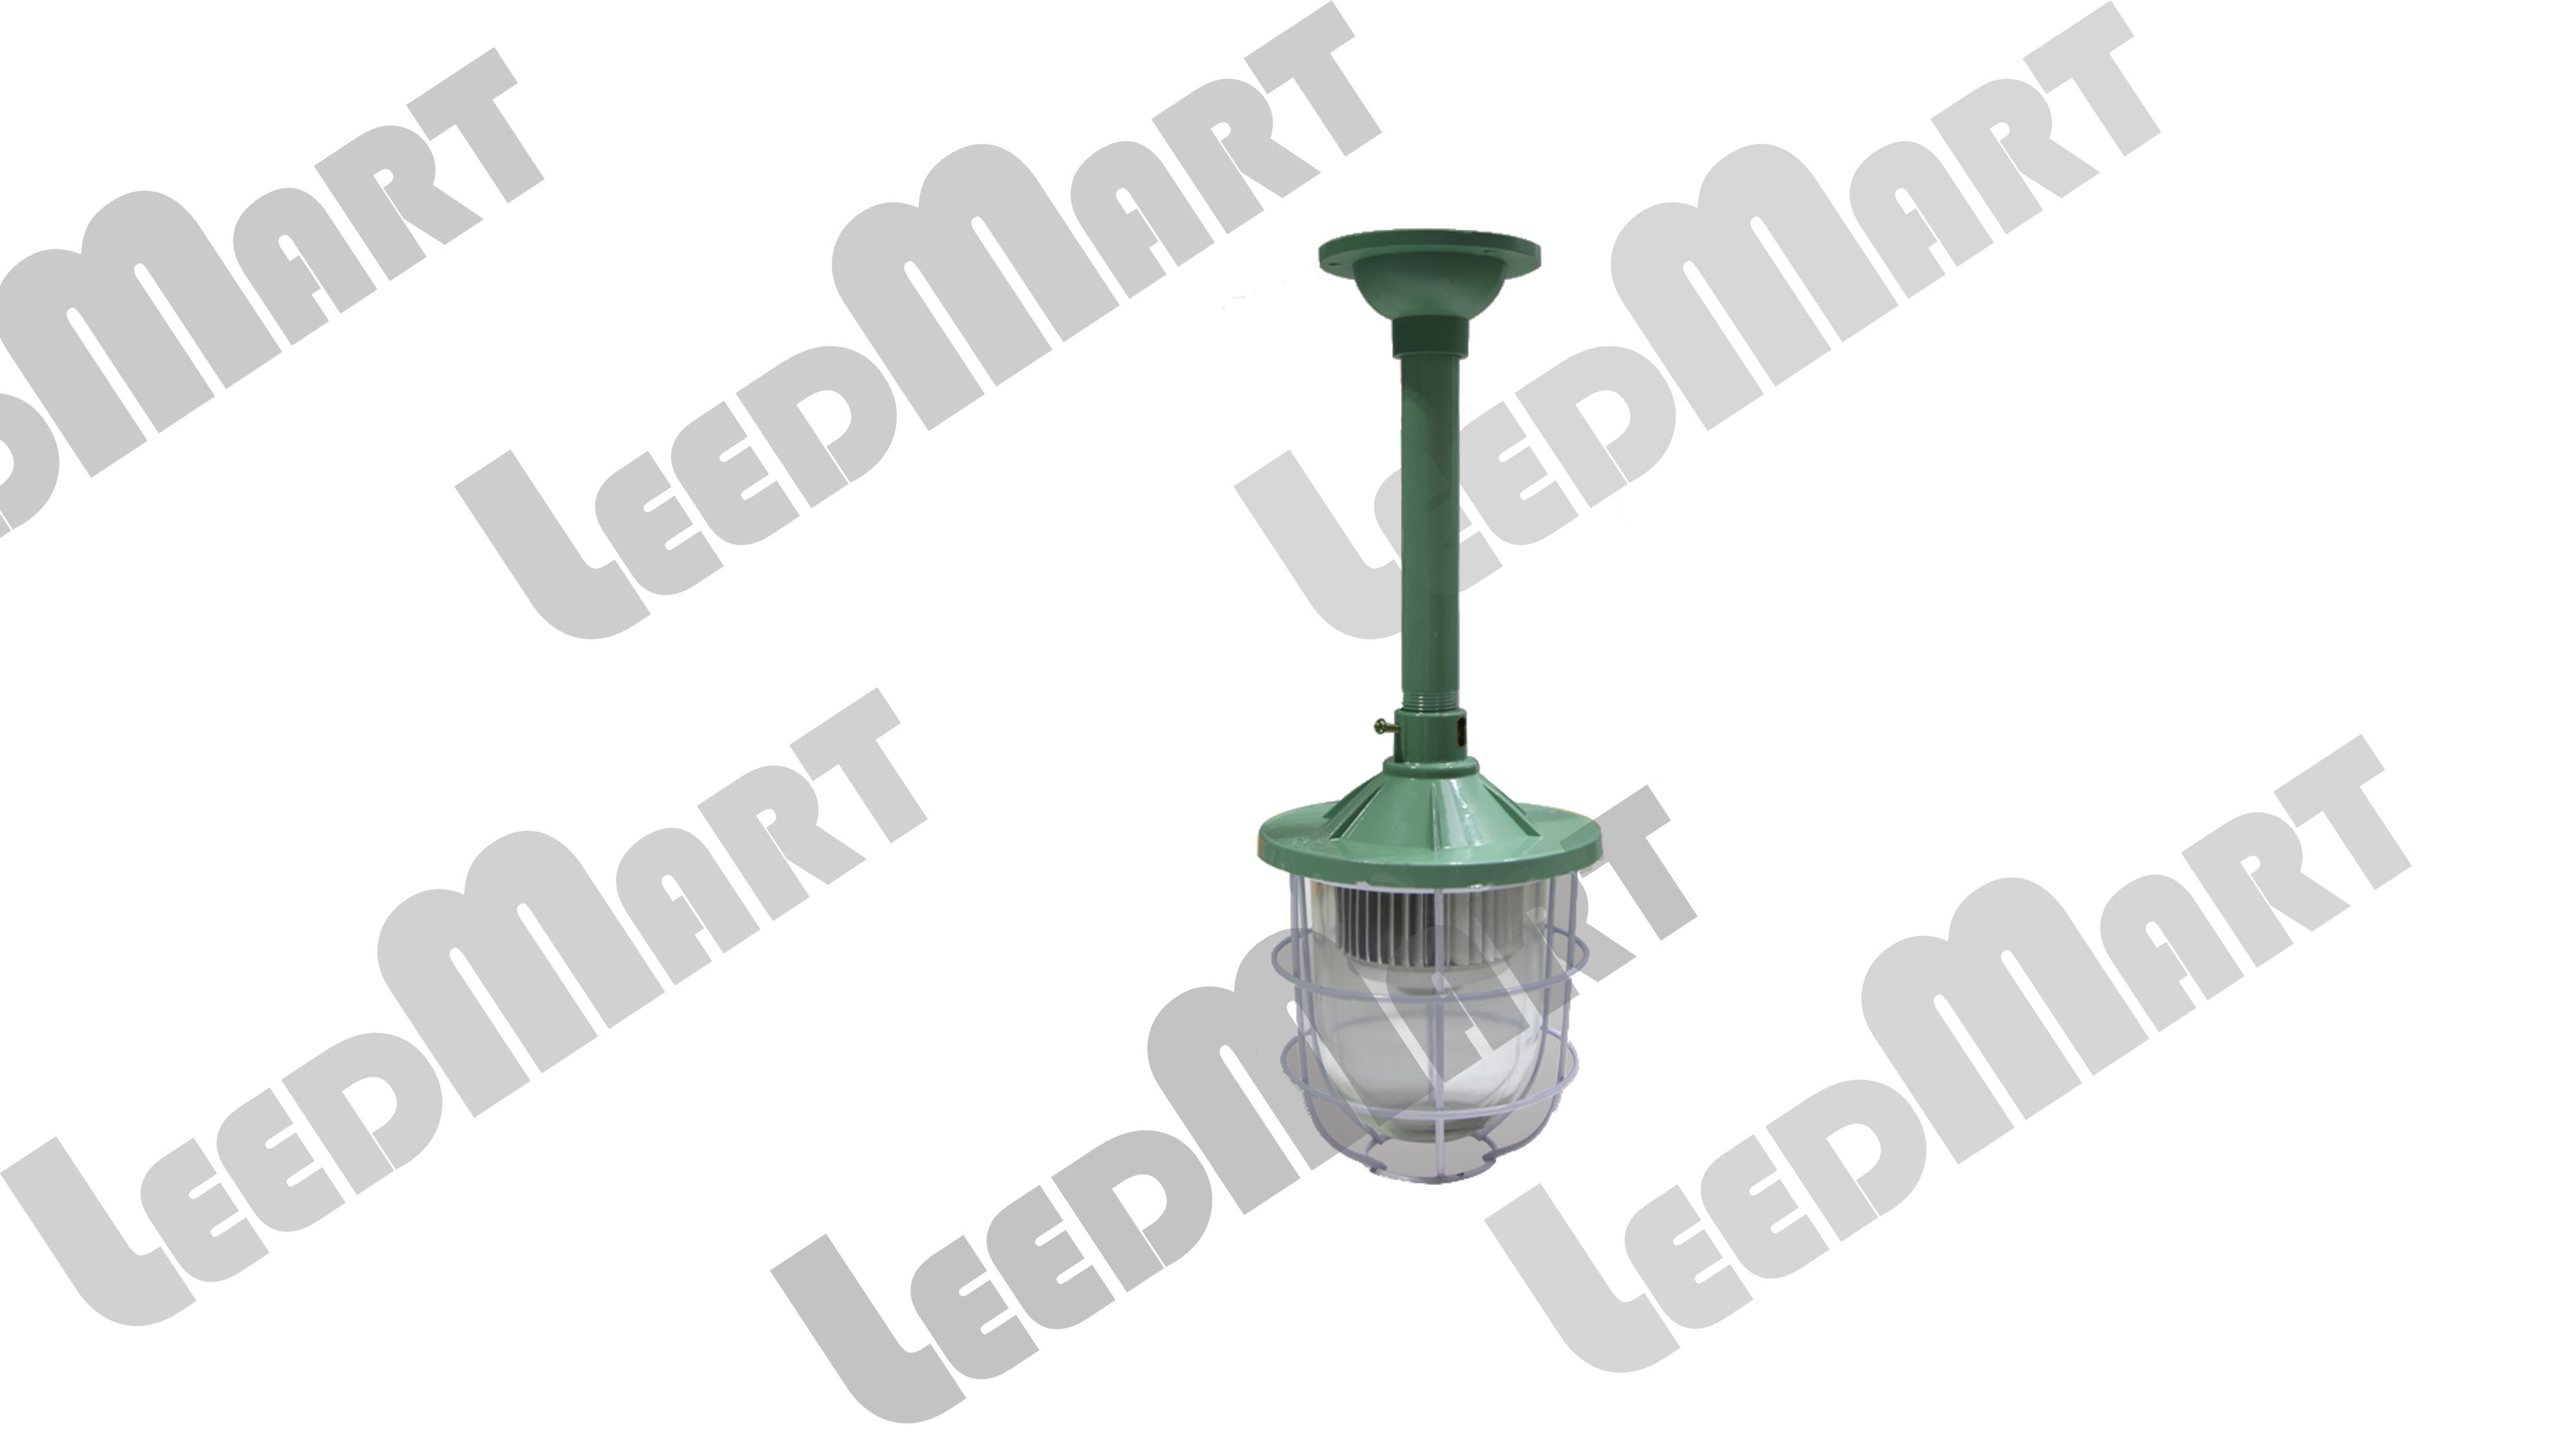 Energy efficient IP65 20watt-60watt 6000 lumen LED explosion Proof light fixture wall mount ceiling mount